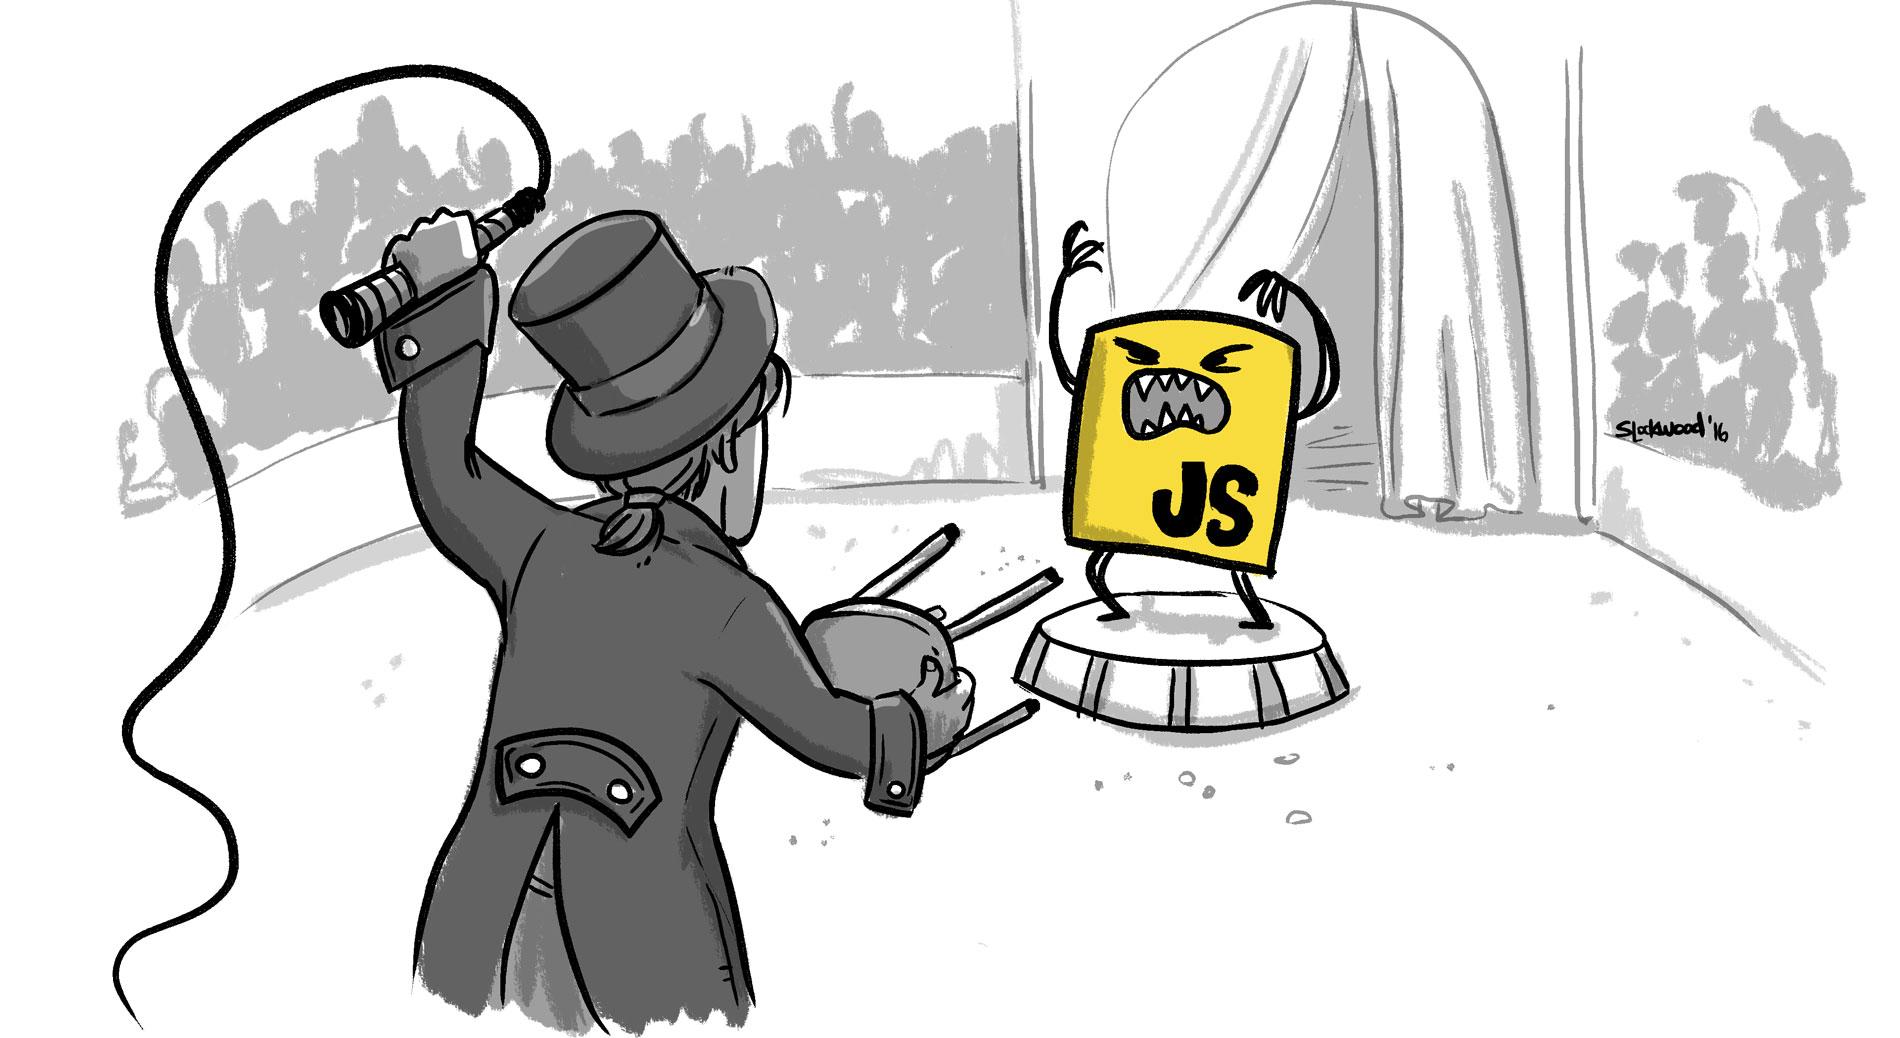 An illustration of a carnival barker holding back the JavaScript logo